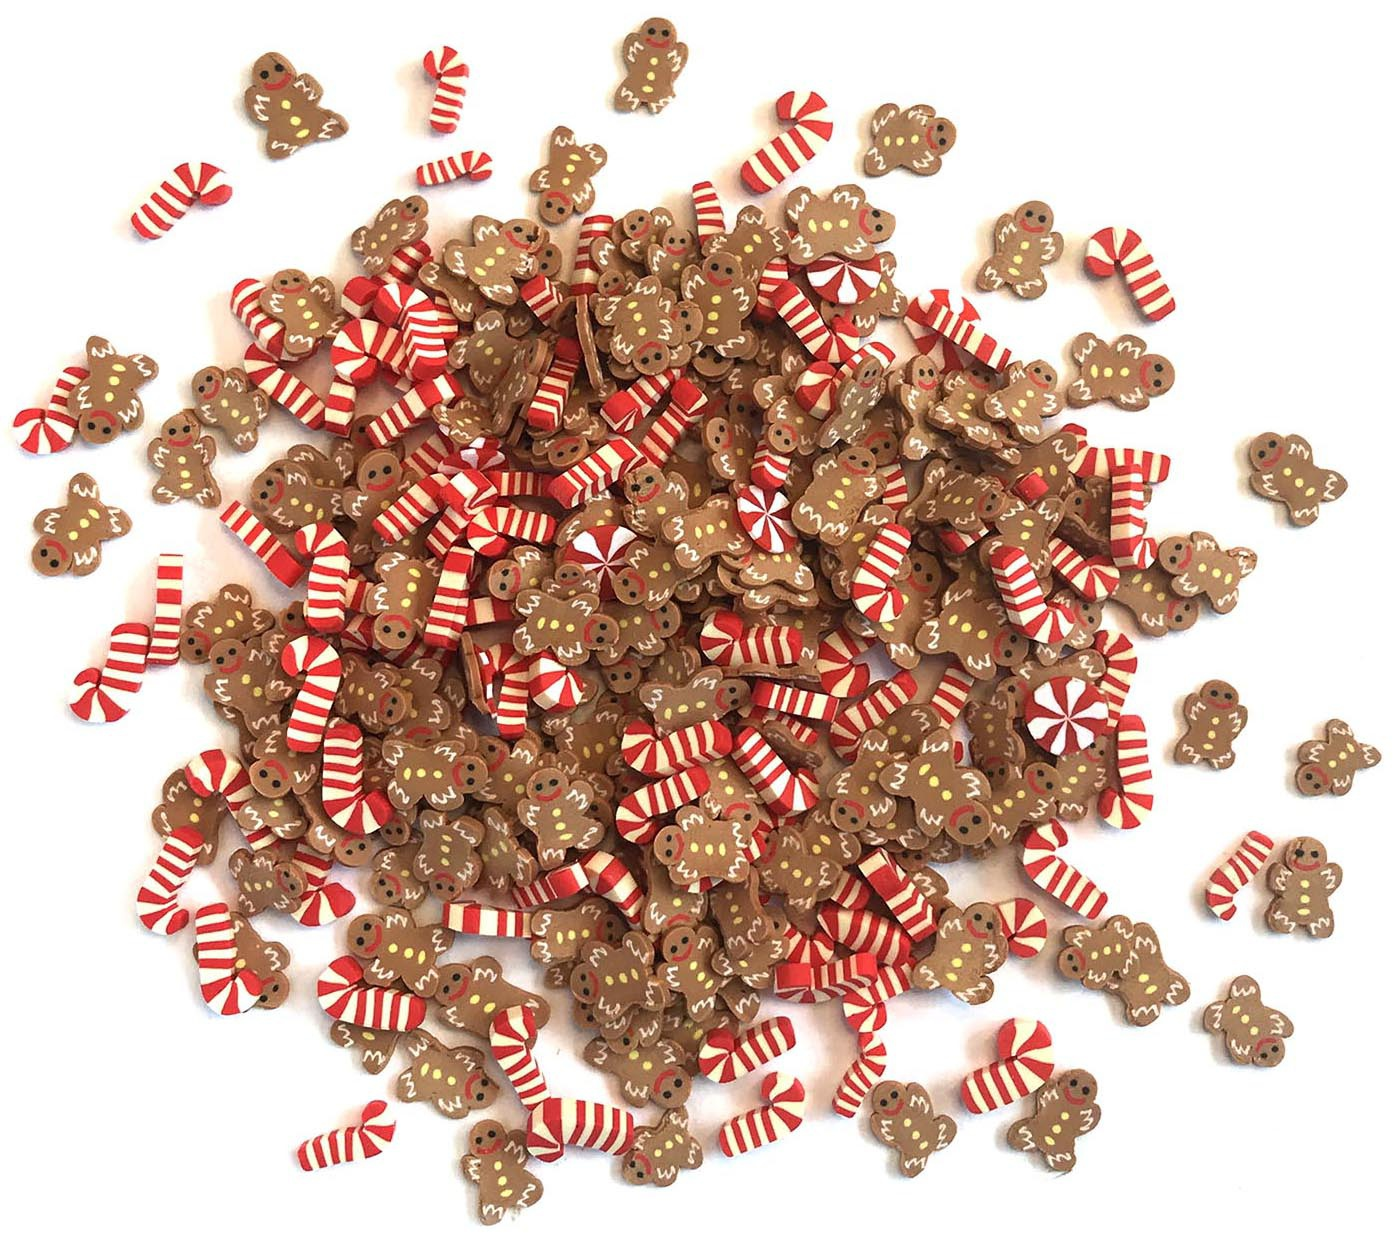 Buttons Galore Sprinkletz Embellishments 12g-Santa's Treats